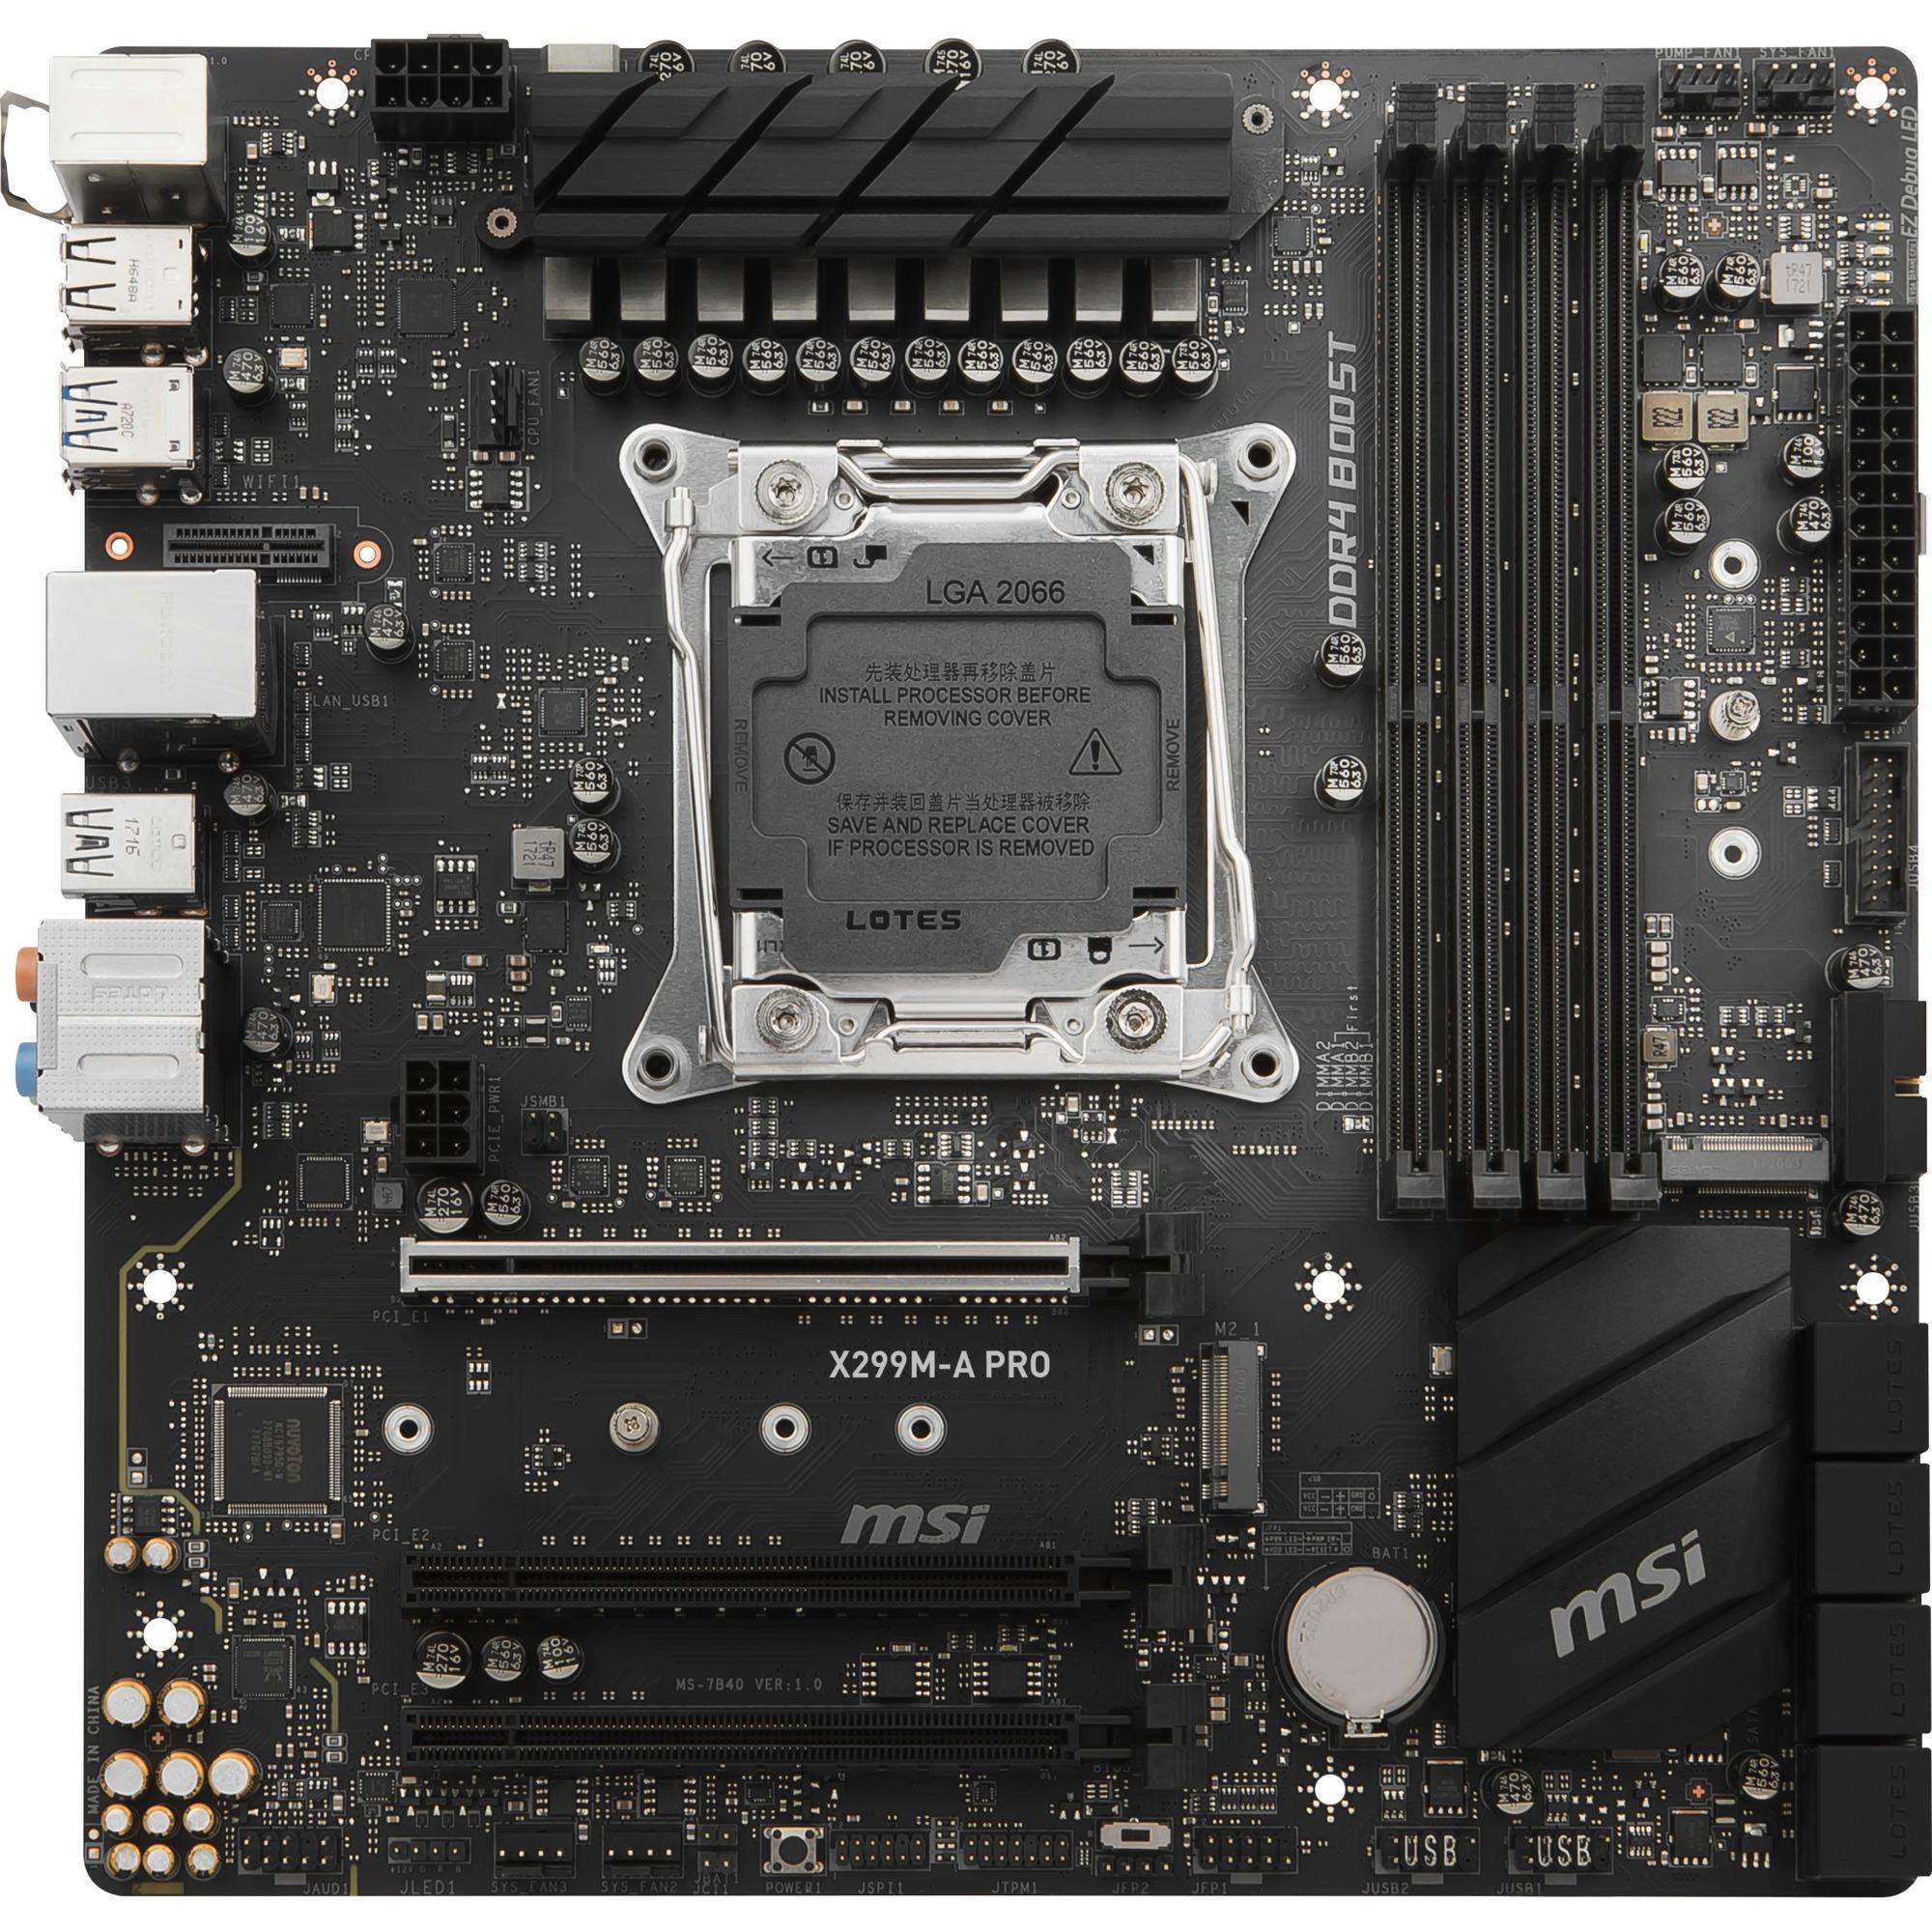 X299M-A Pro Intel X299 LGA 2066 Micro ATX carte mère